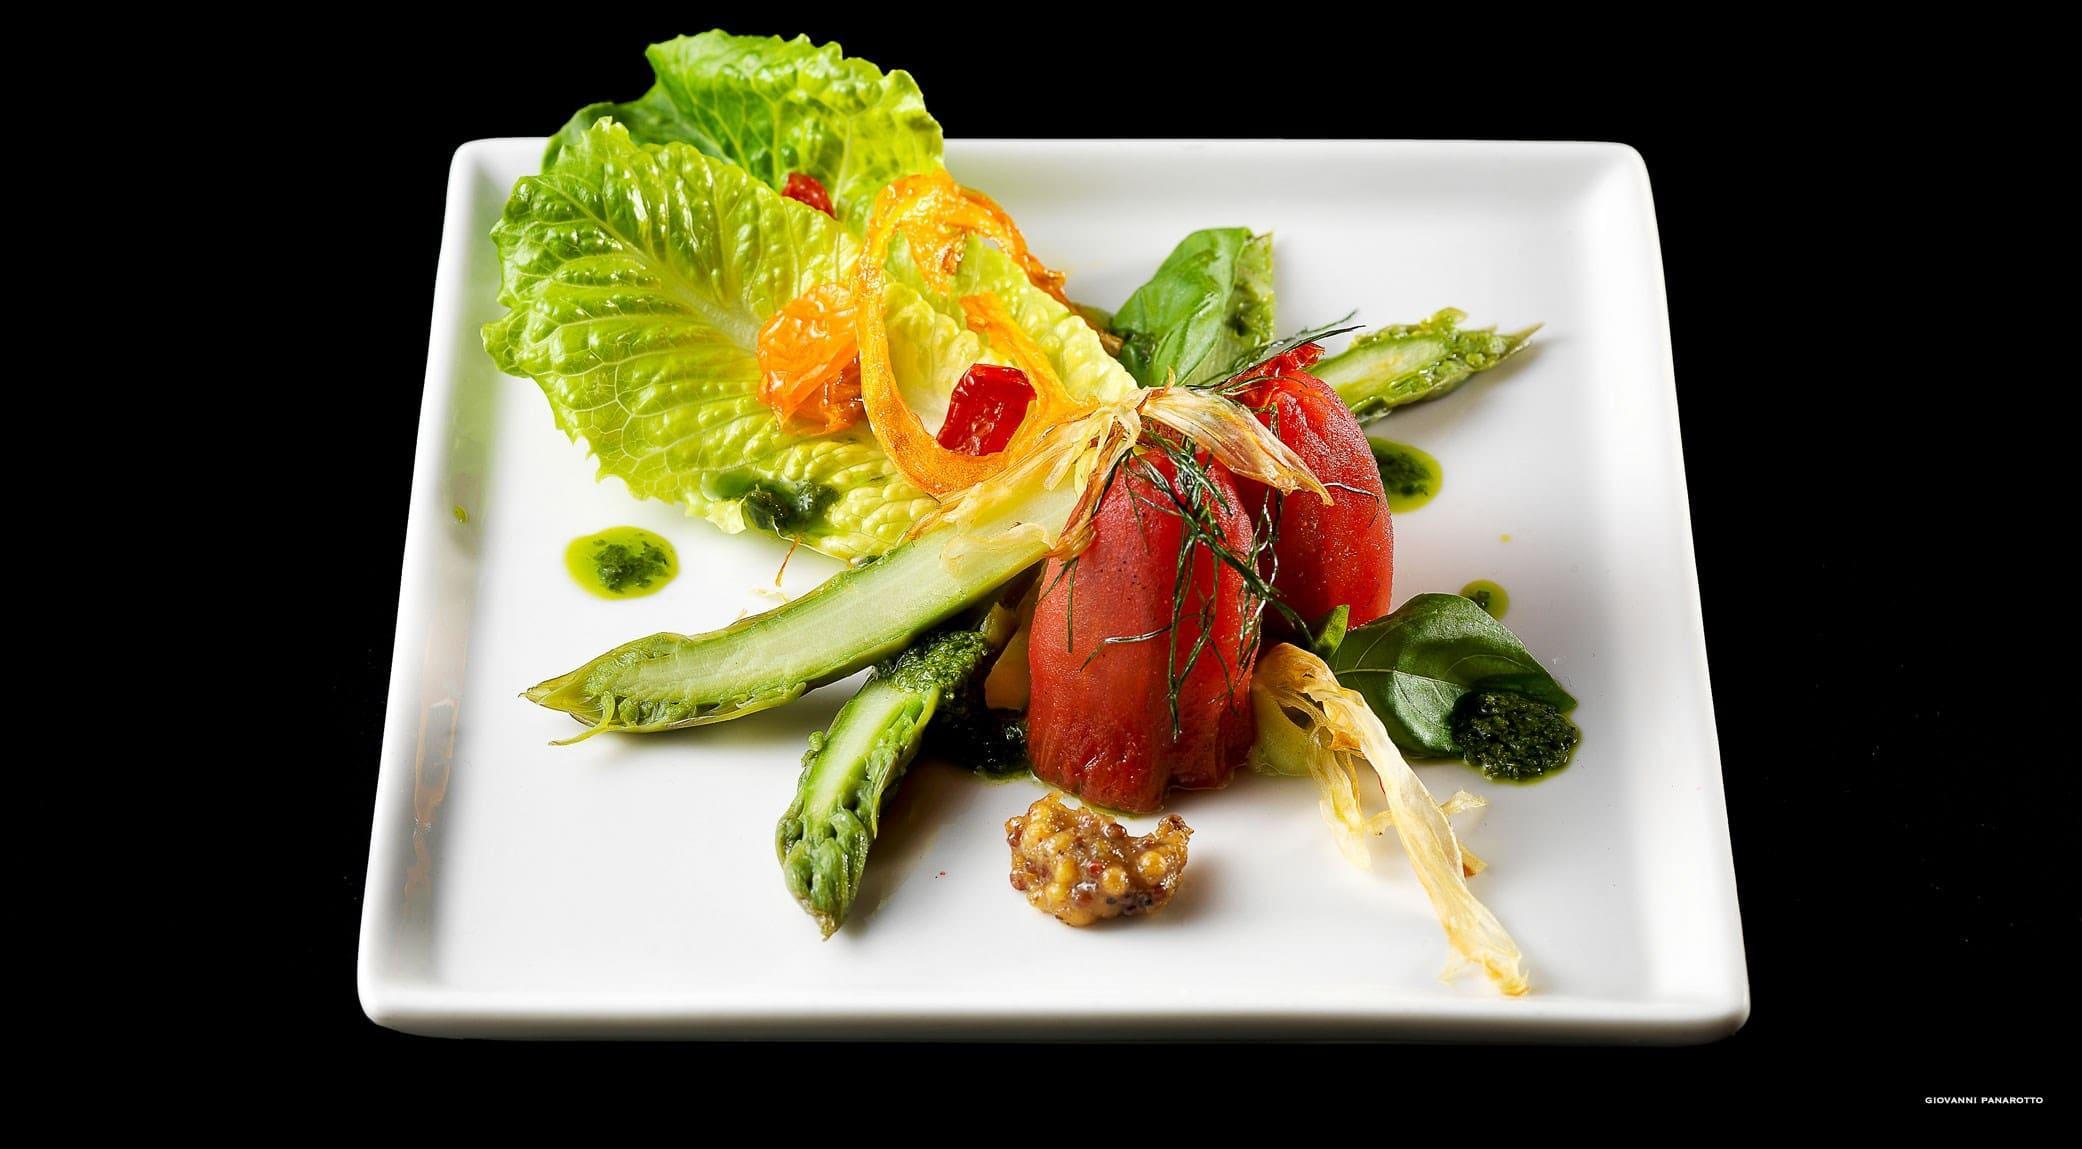 original_015-tomato-salad-ramsay.jpg